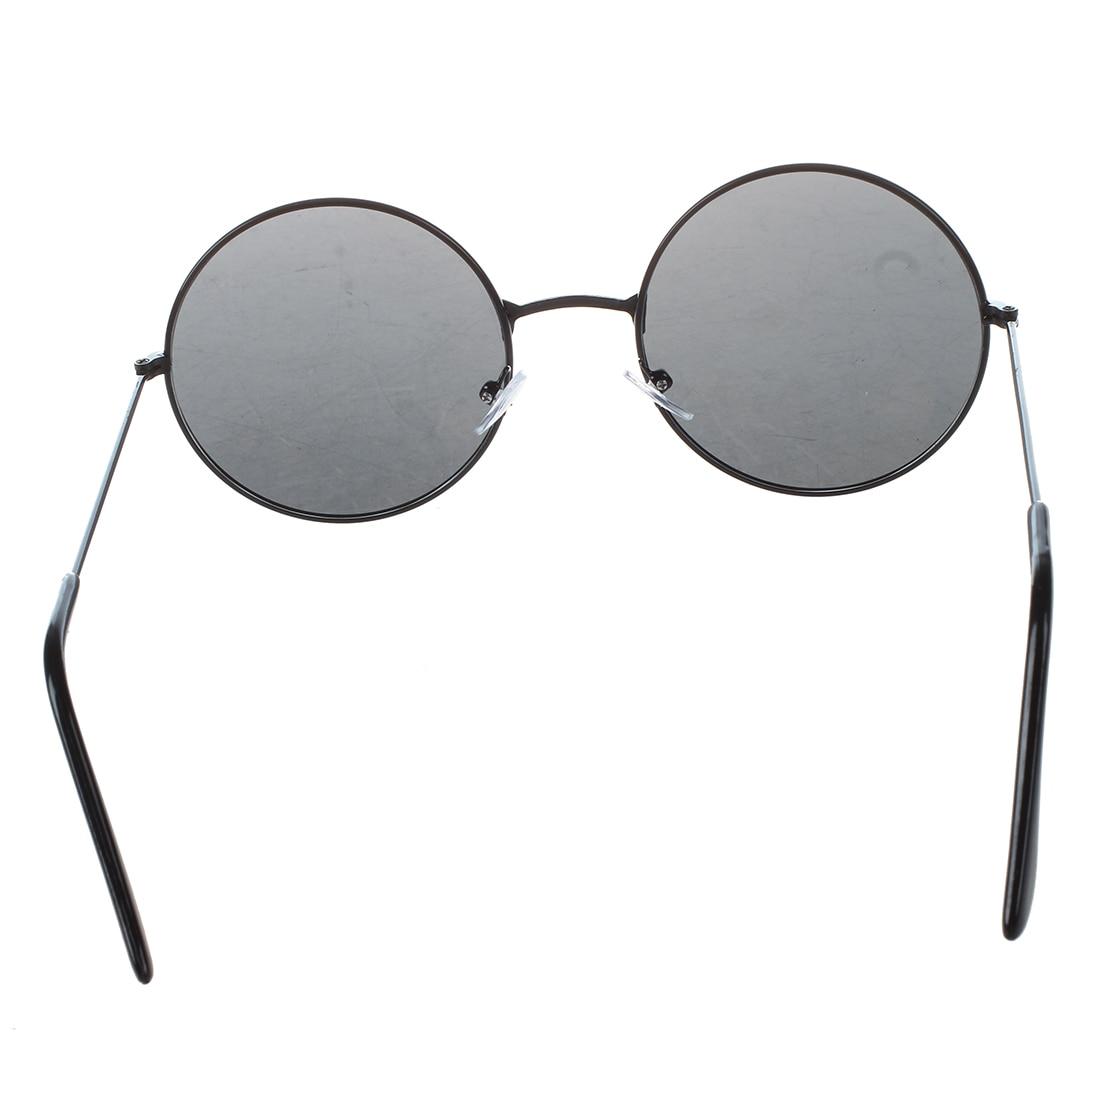 Trendy Men Women Metal Frame Black Lens Round Sunglasses Glasses Eyewear